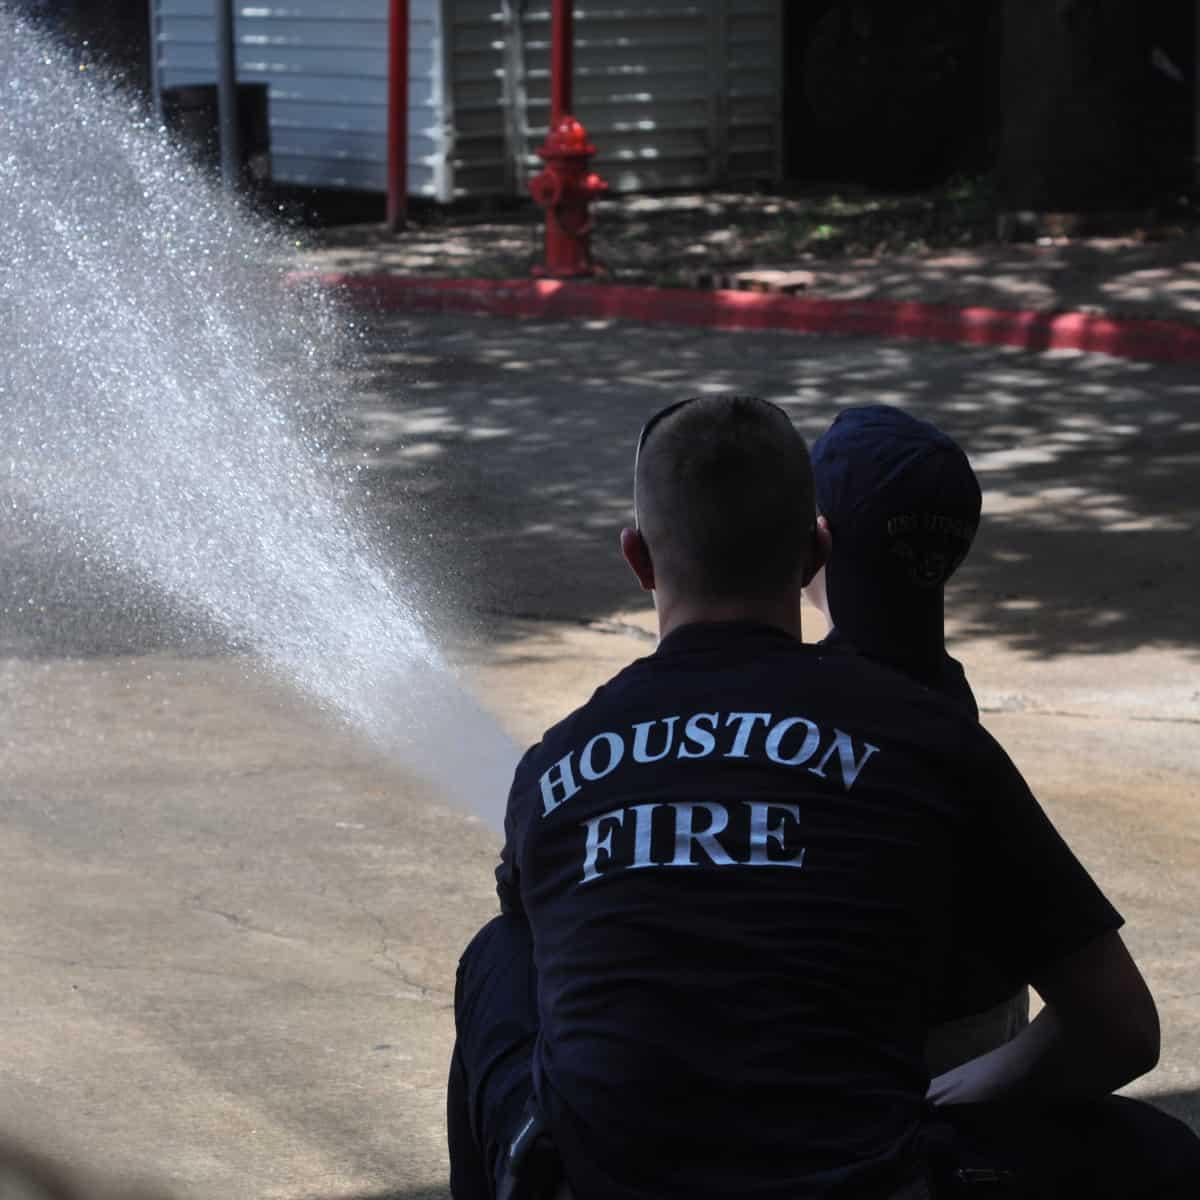 Spraying Hose at Houston Fire Station